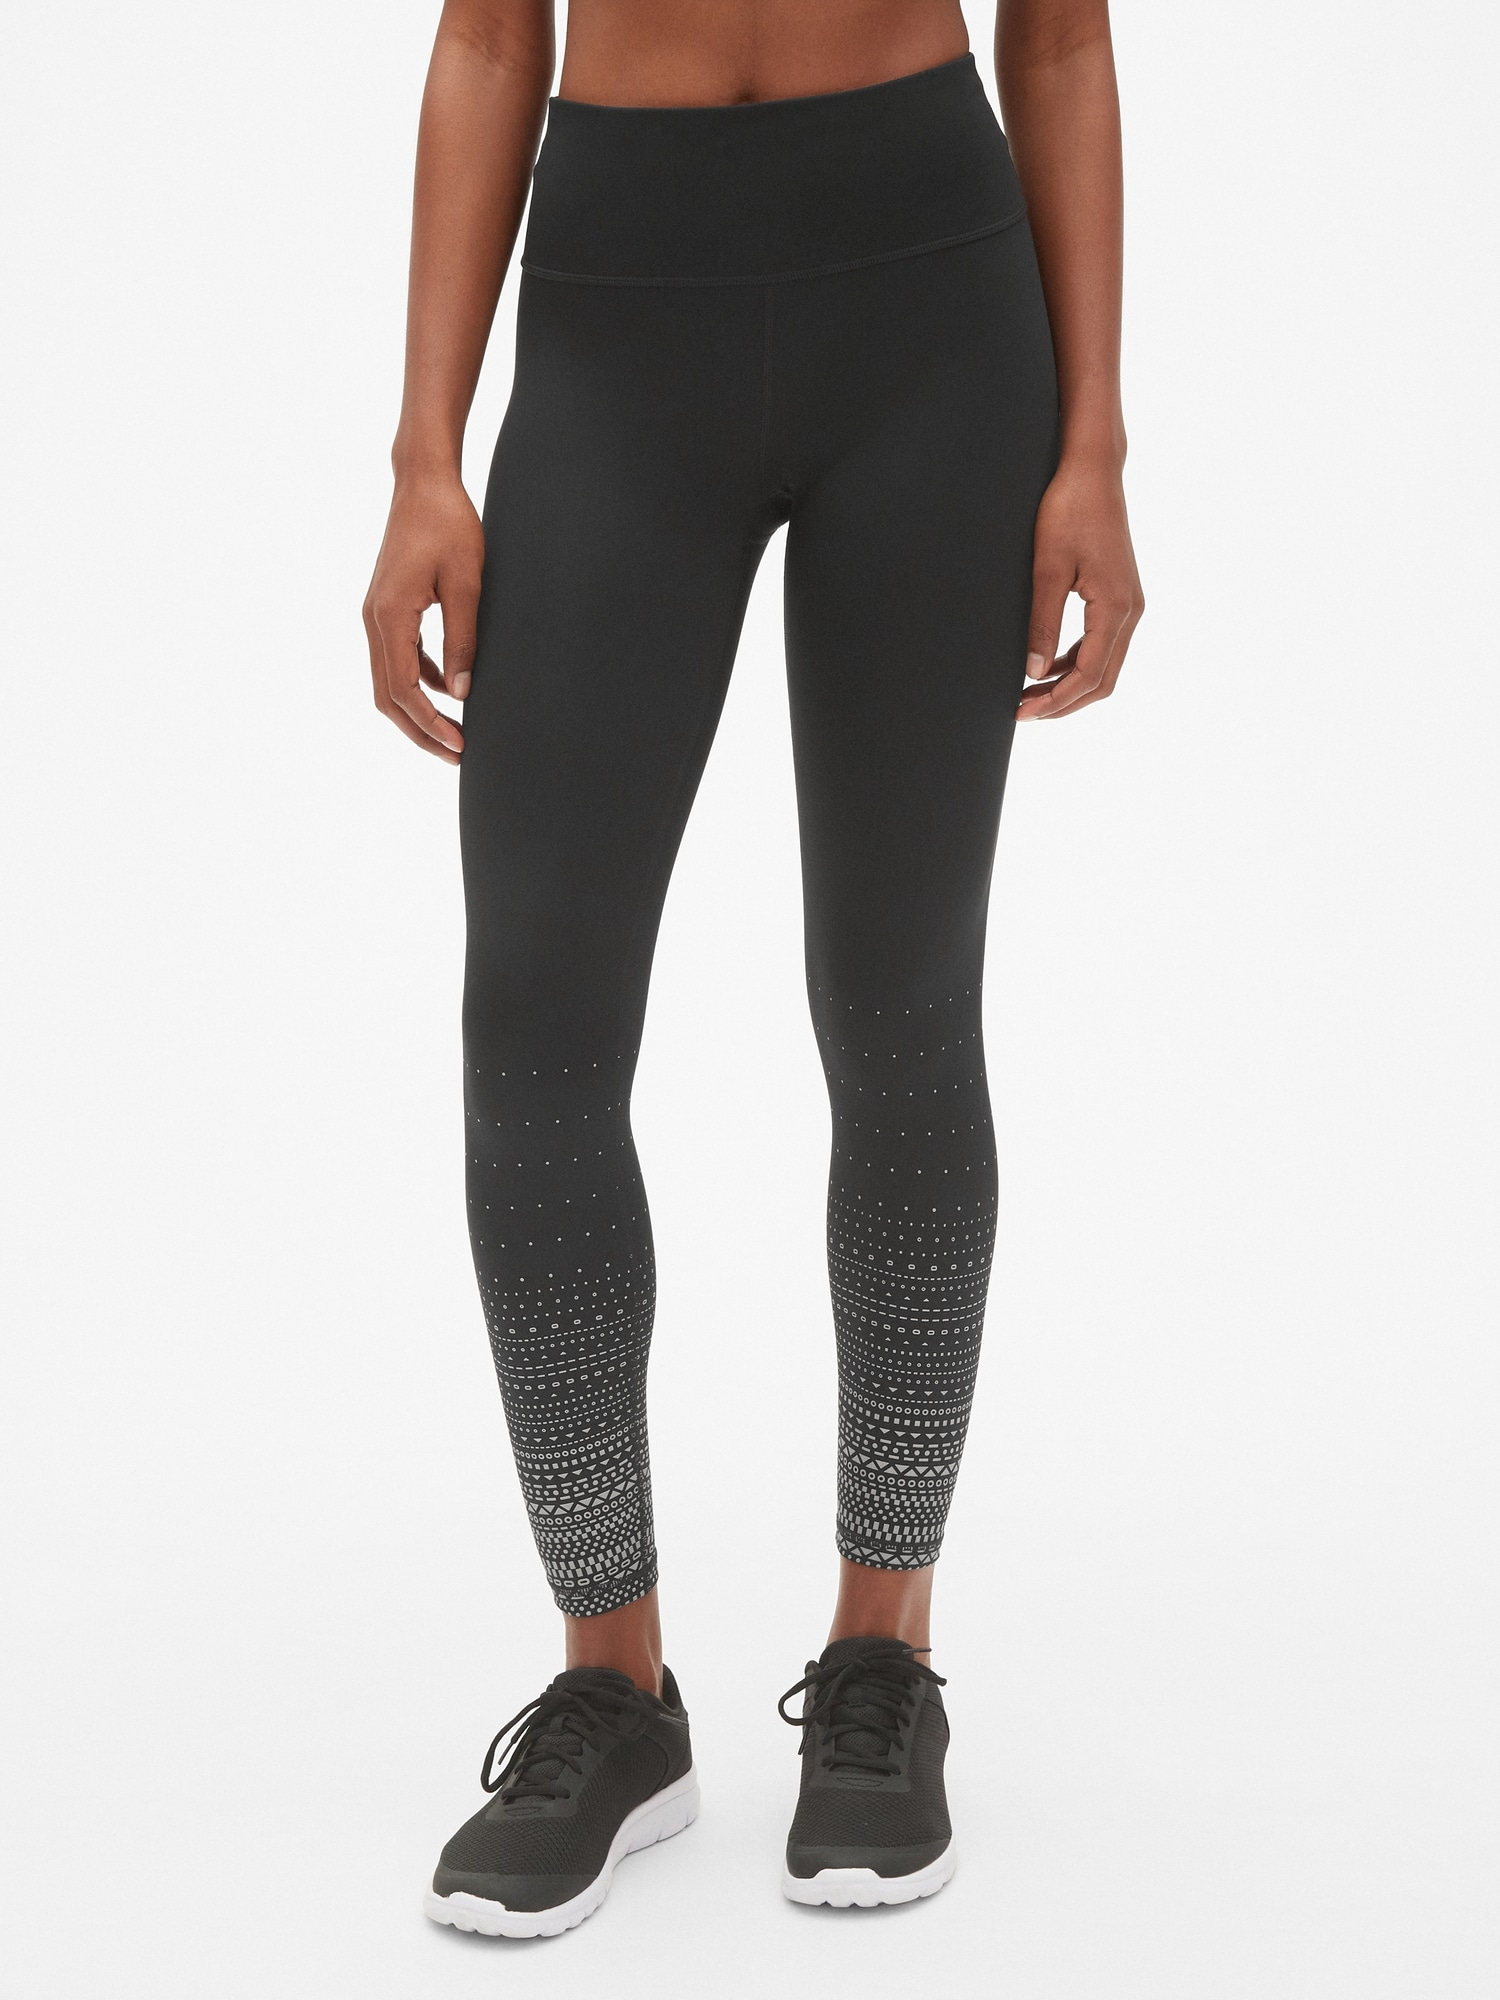 4d7a947e6e0ed GapFit Winterbrush High Rise Reflective Print Full Length Leggings | Gap